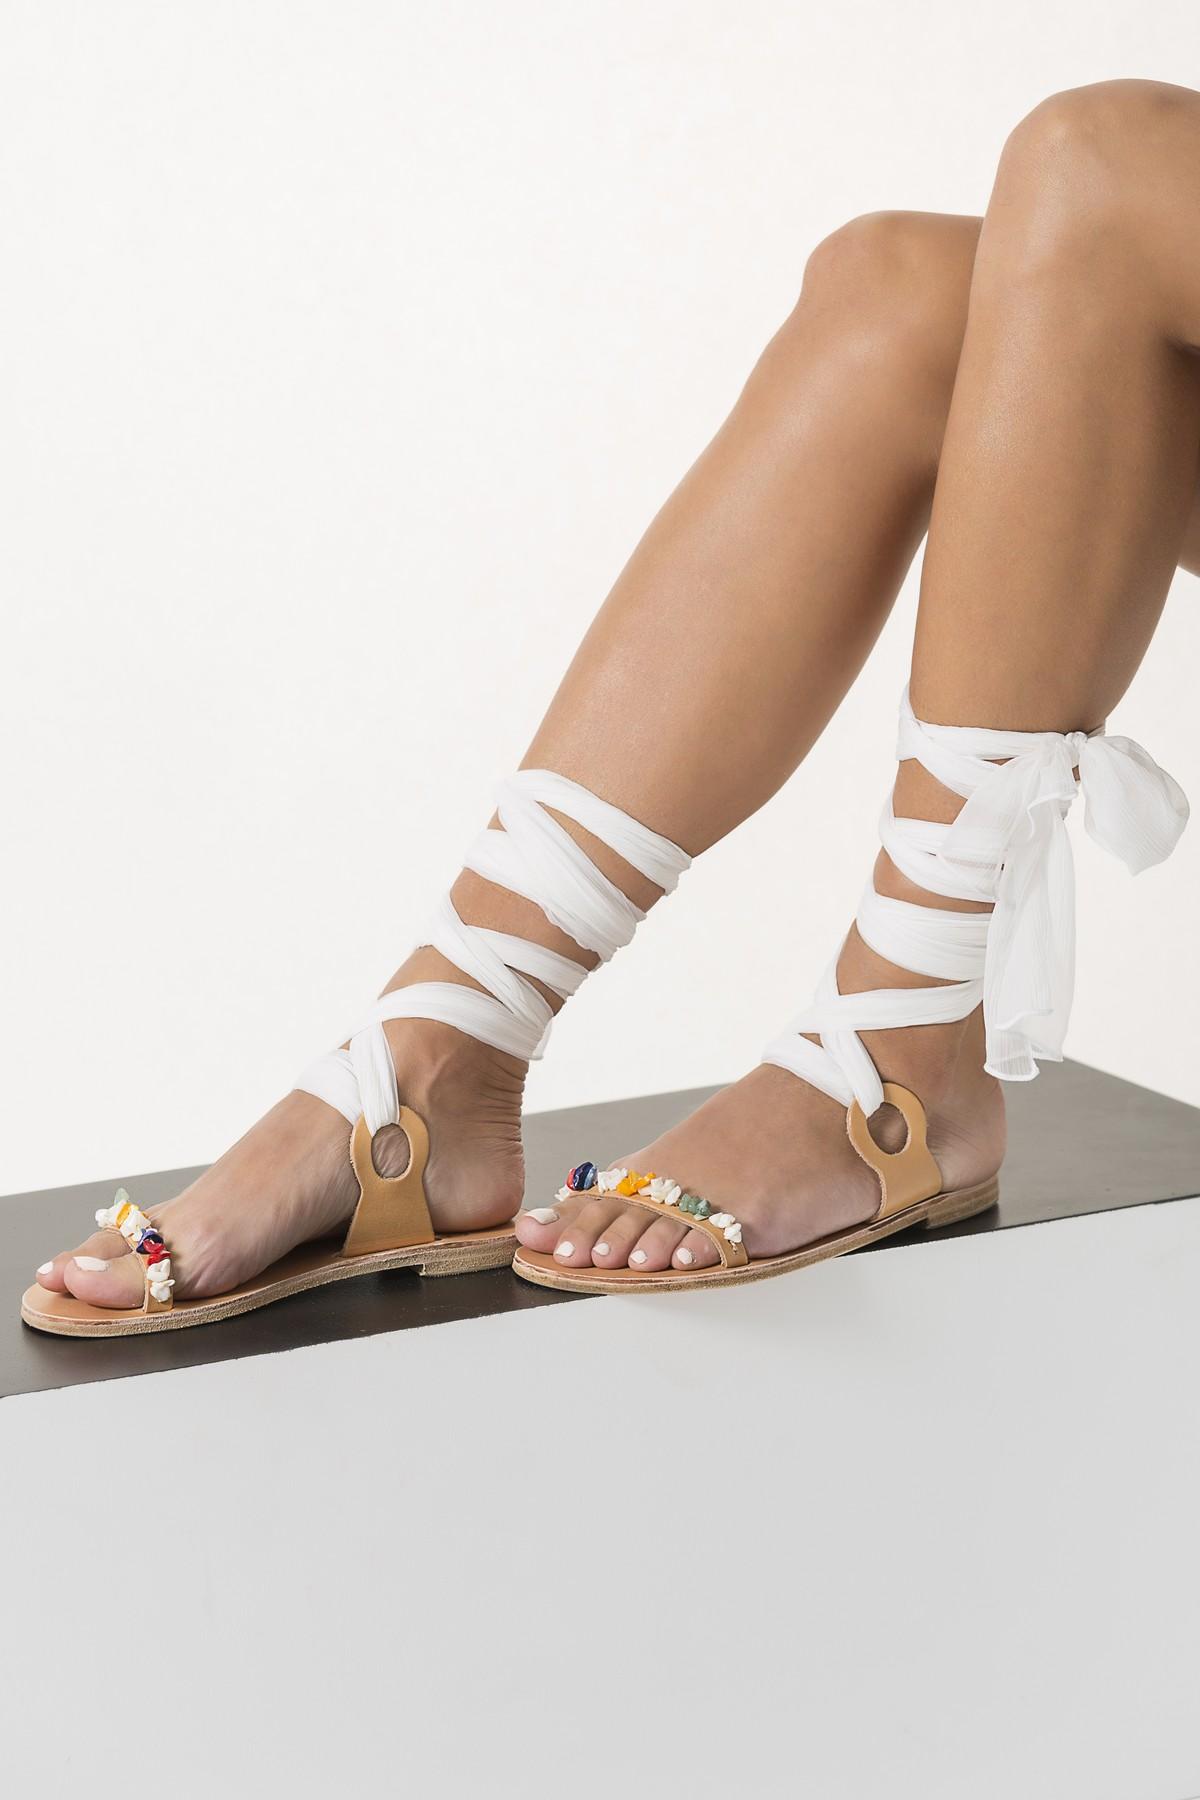 Beach Wedding Lace Up Sandals Beaded Quot Charis Quot Greek